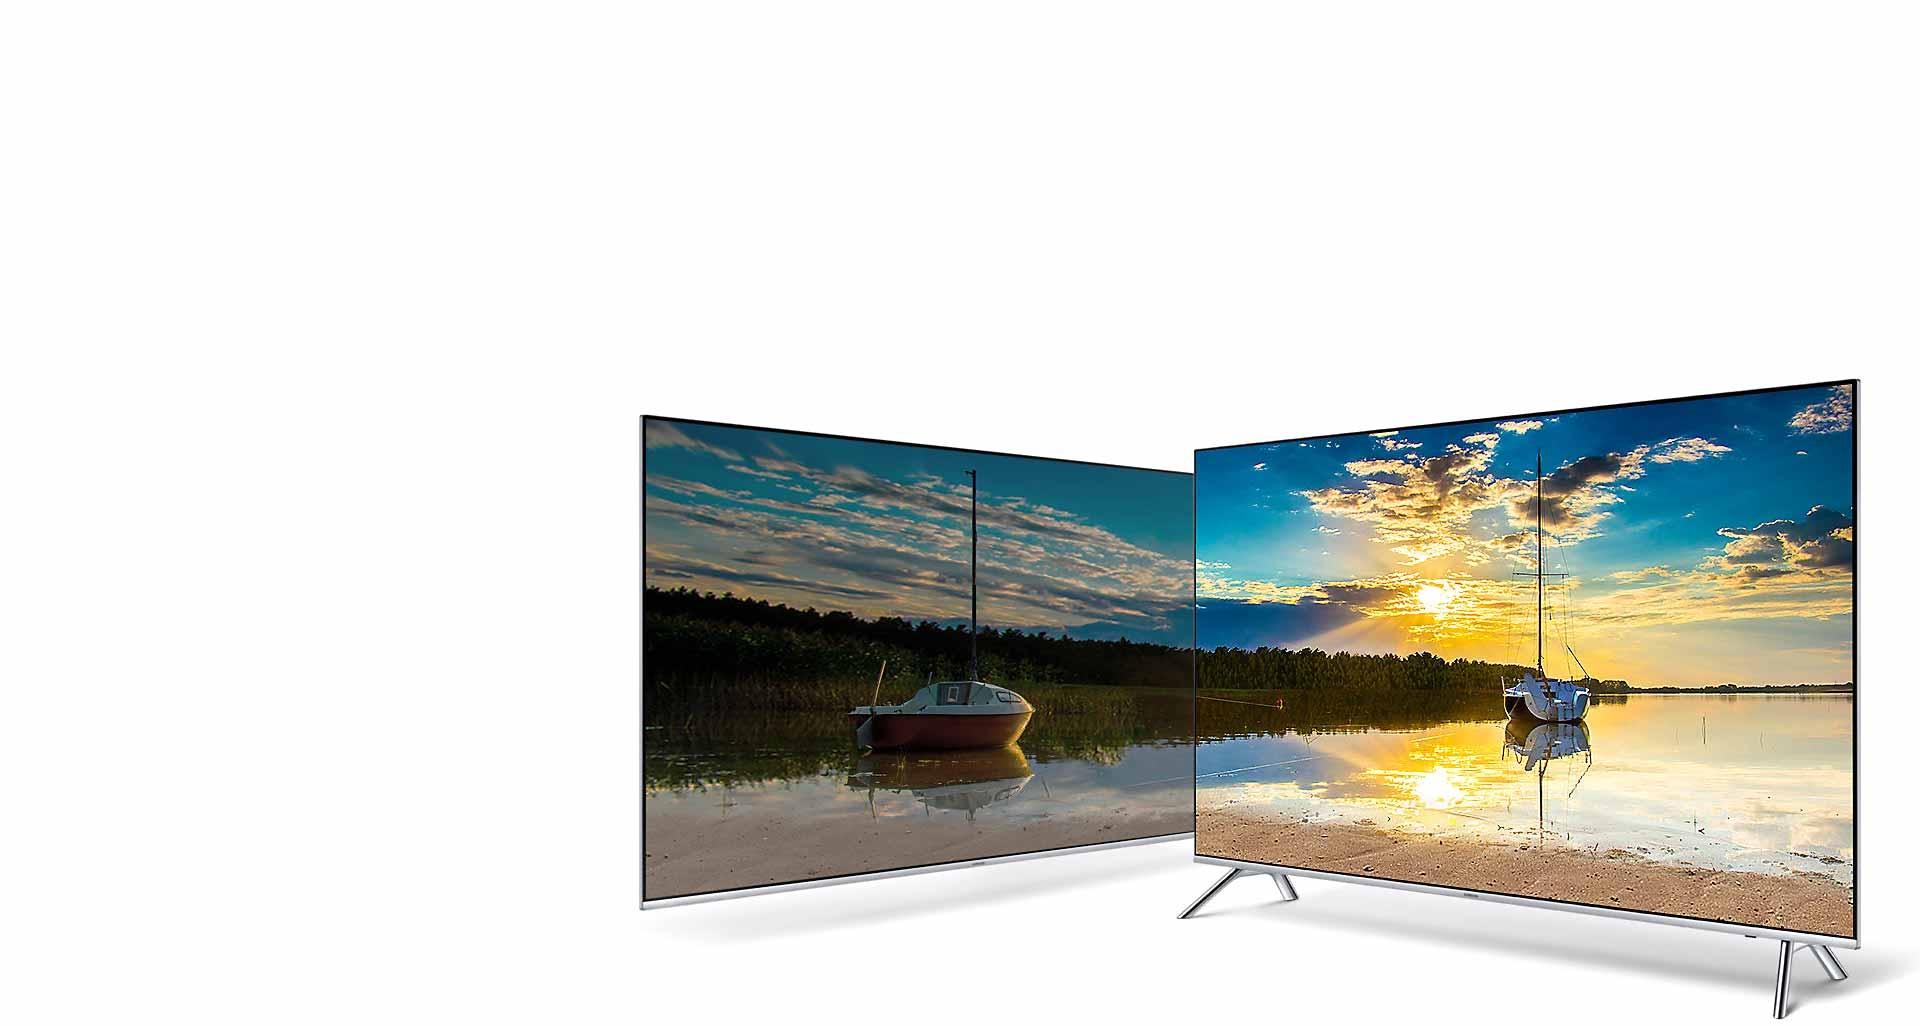 تلویزیون ال ای دی MU8990 مجهز به تکنولوژی HDR1000